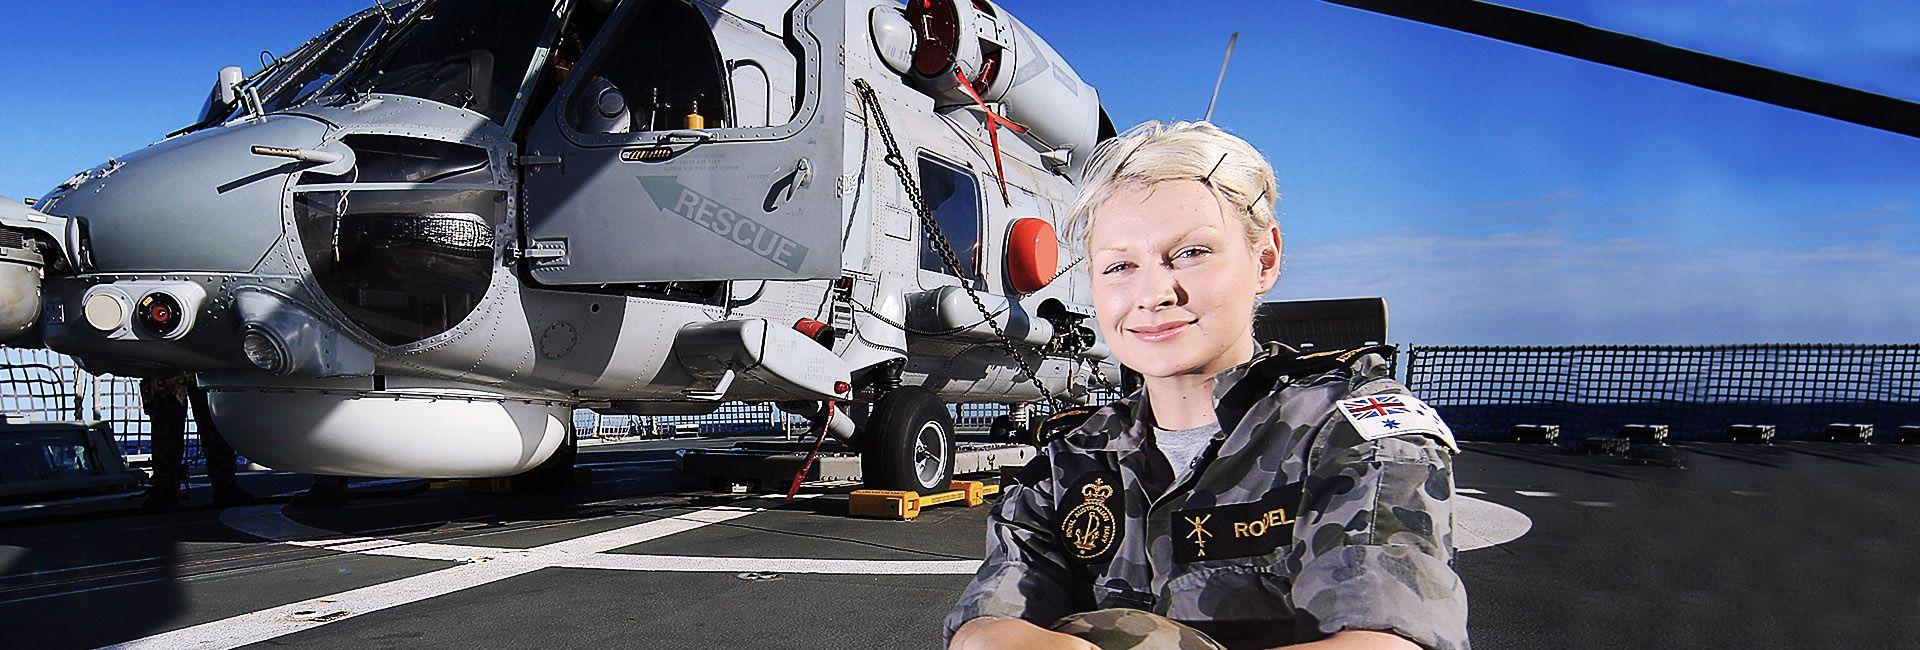 Aircraft Maintenance Technician Salary Australia ...